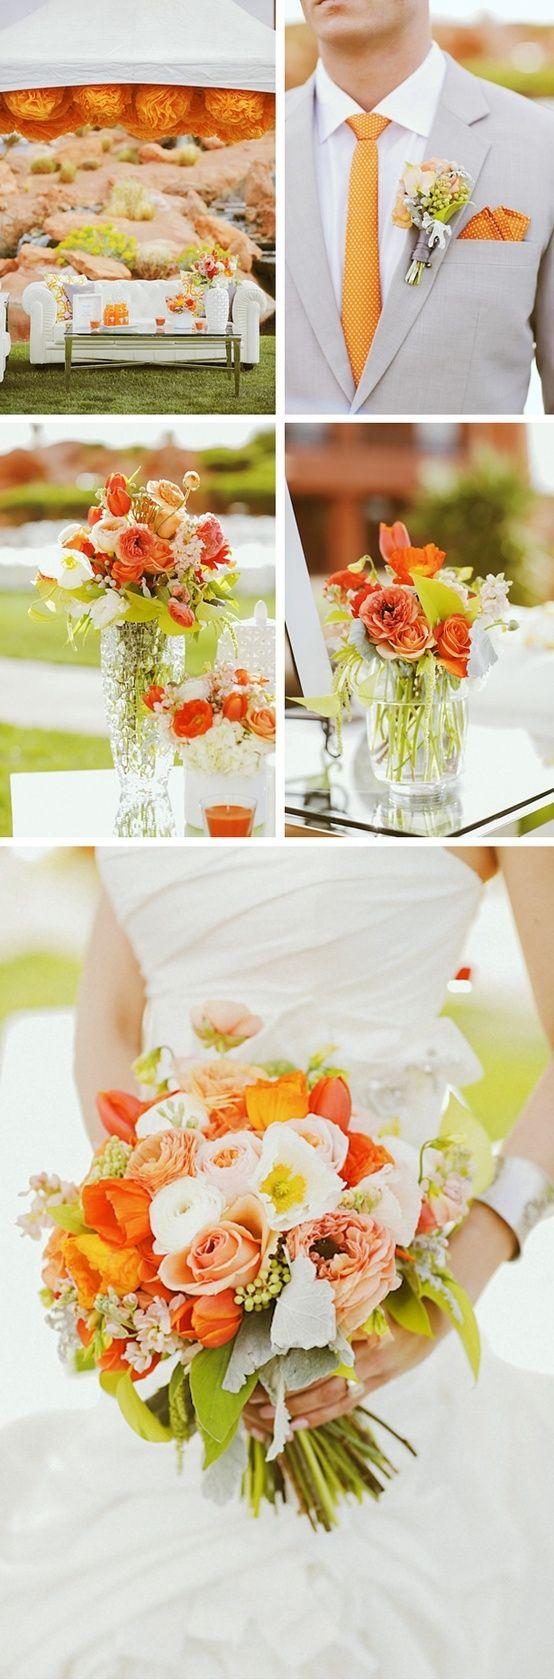 Orange Wedding Accents